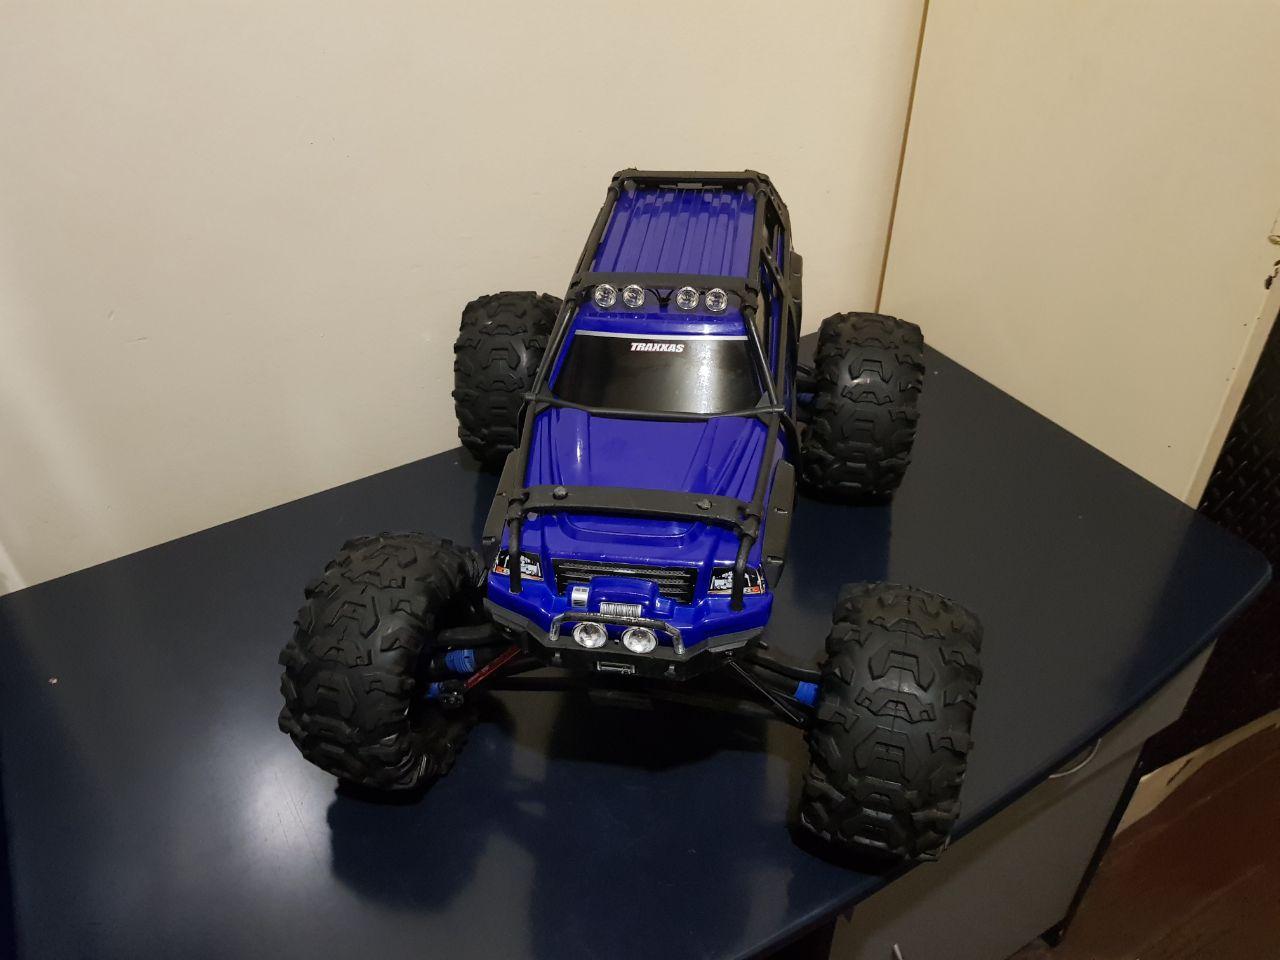 Traxxis Summit Remote control car